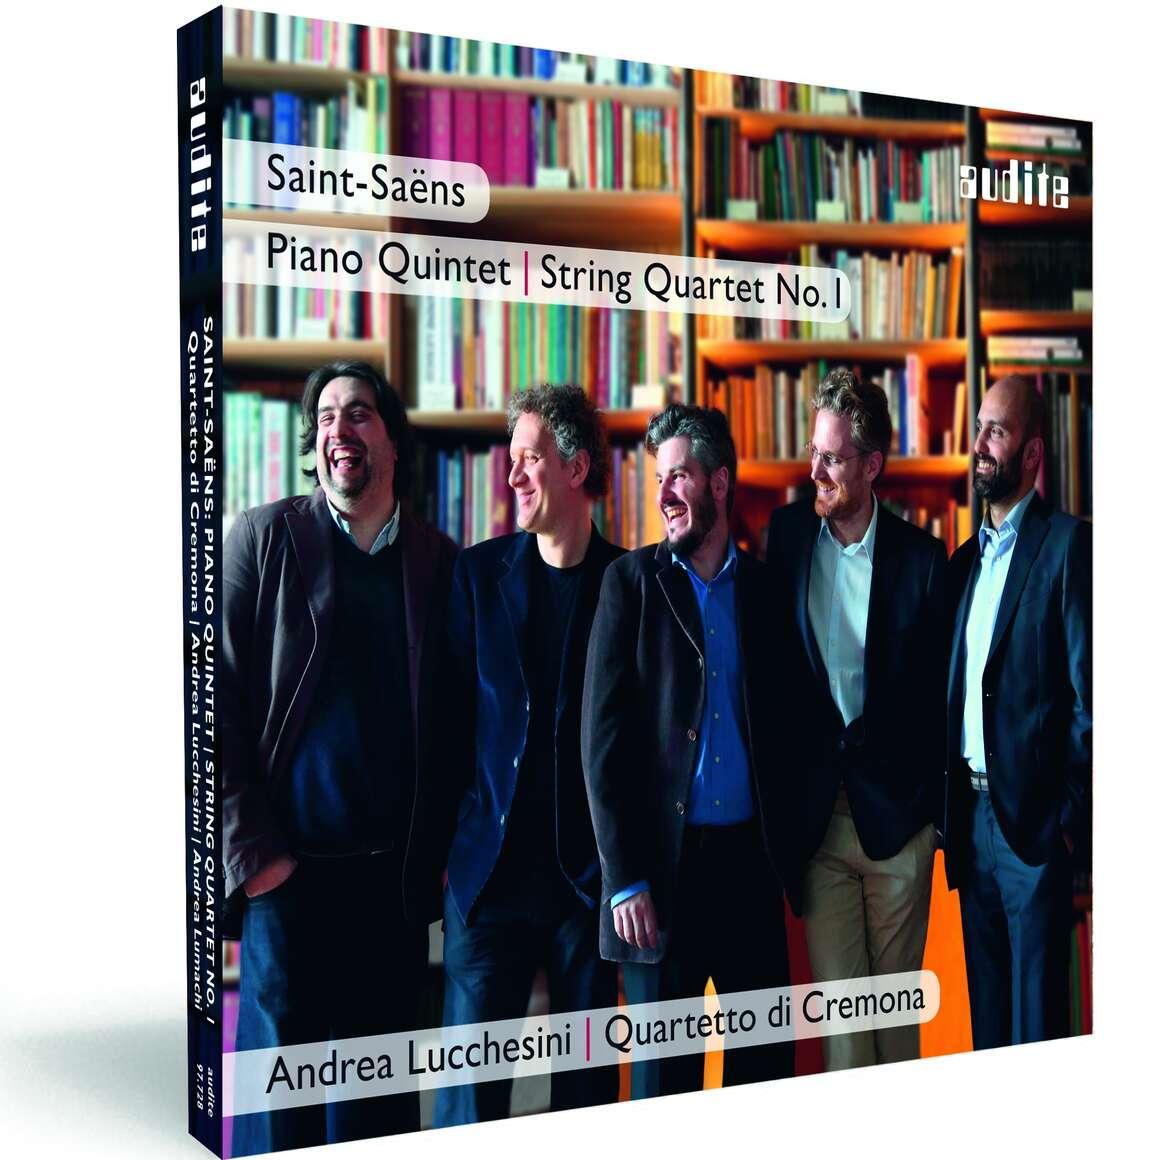 Saint-Saëns: Piano Quintet & String Quartet No. 1